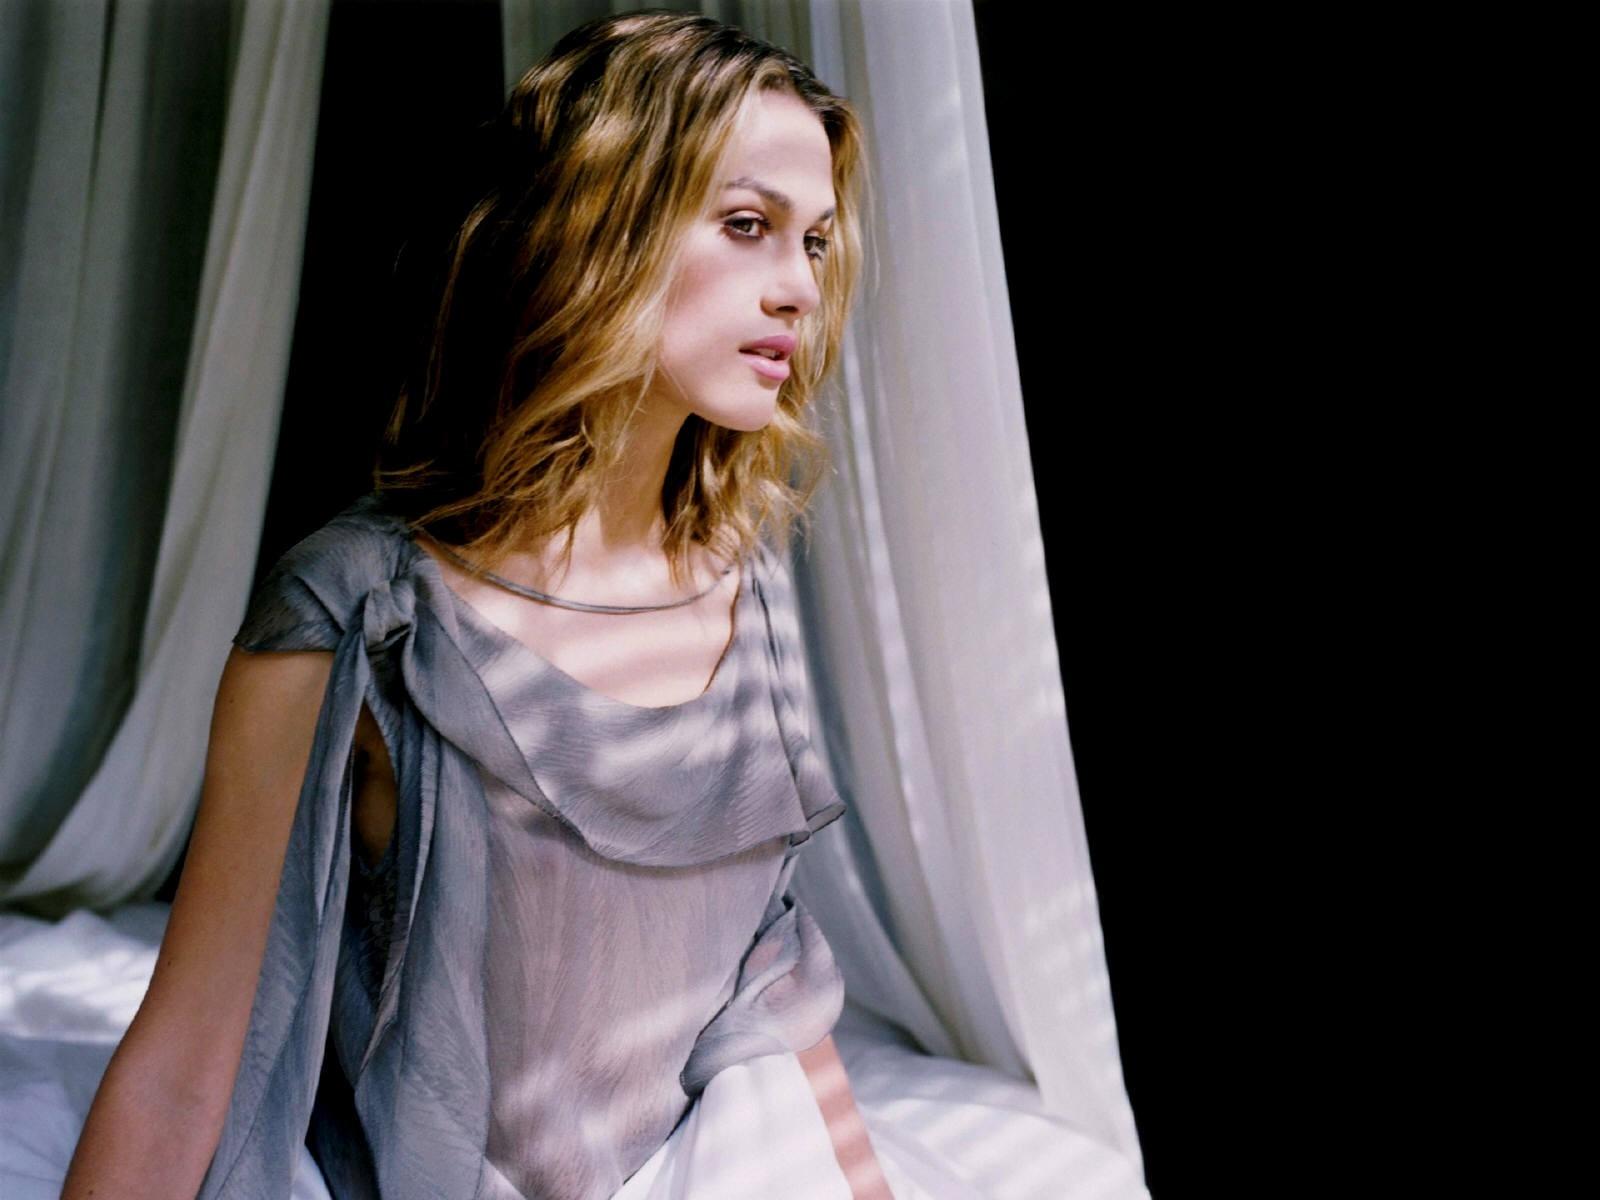 Wallpaper - riflessi di luce e sensualità per Keira Knightley